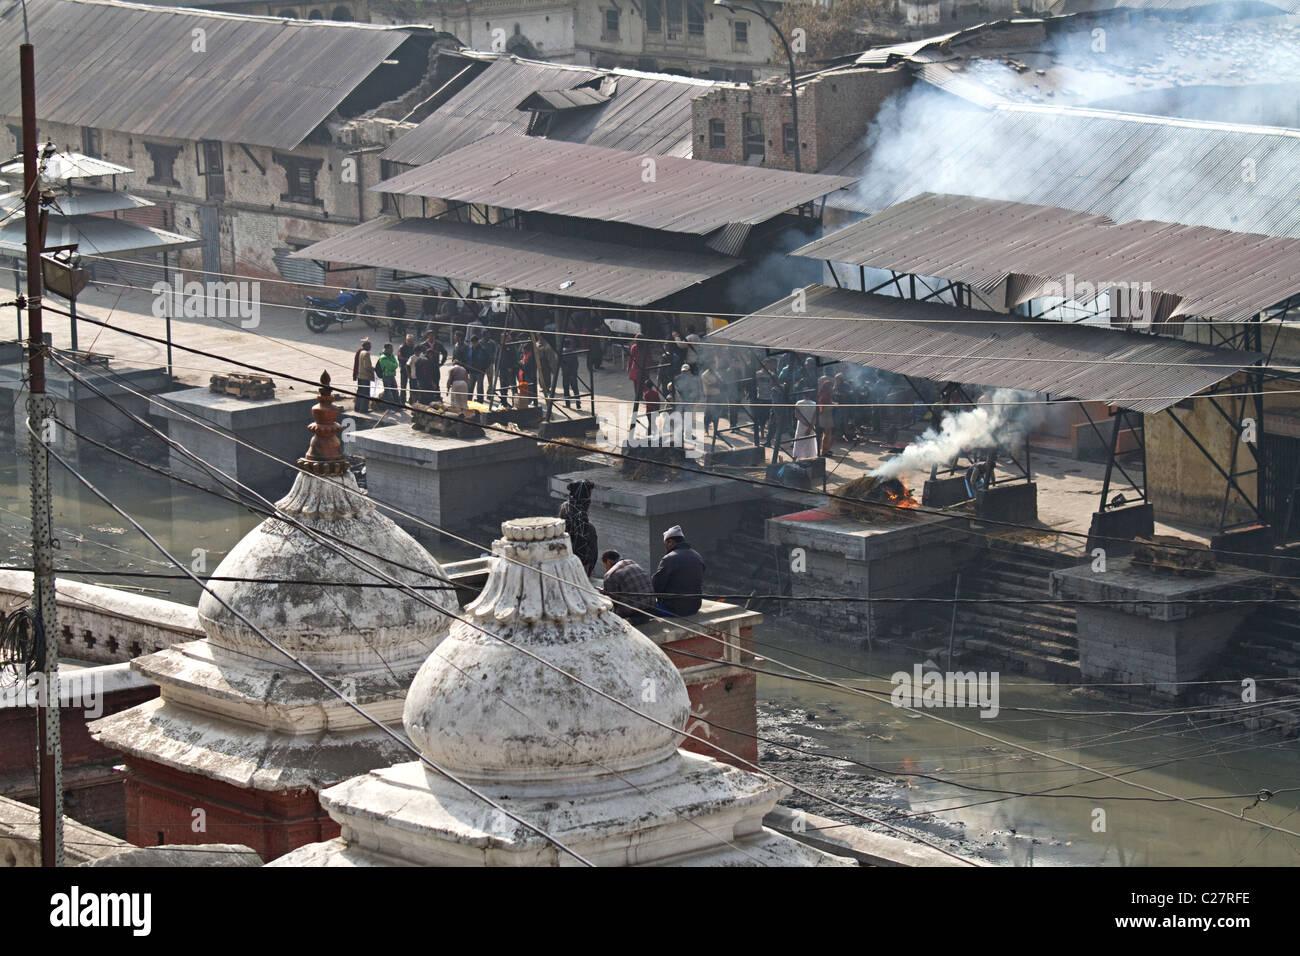 Funeral rite burning bodies at Pashupatinath temple. Kathmandu, Nepal - Stock Image